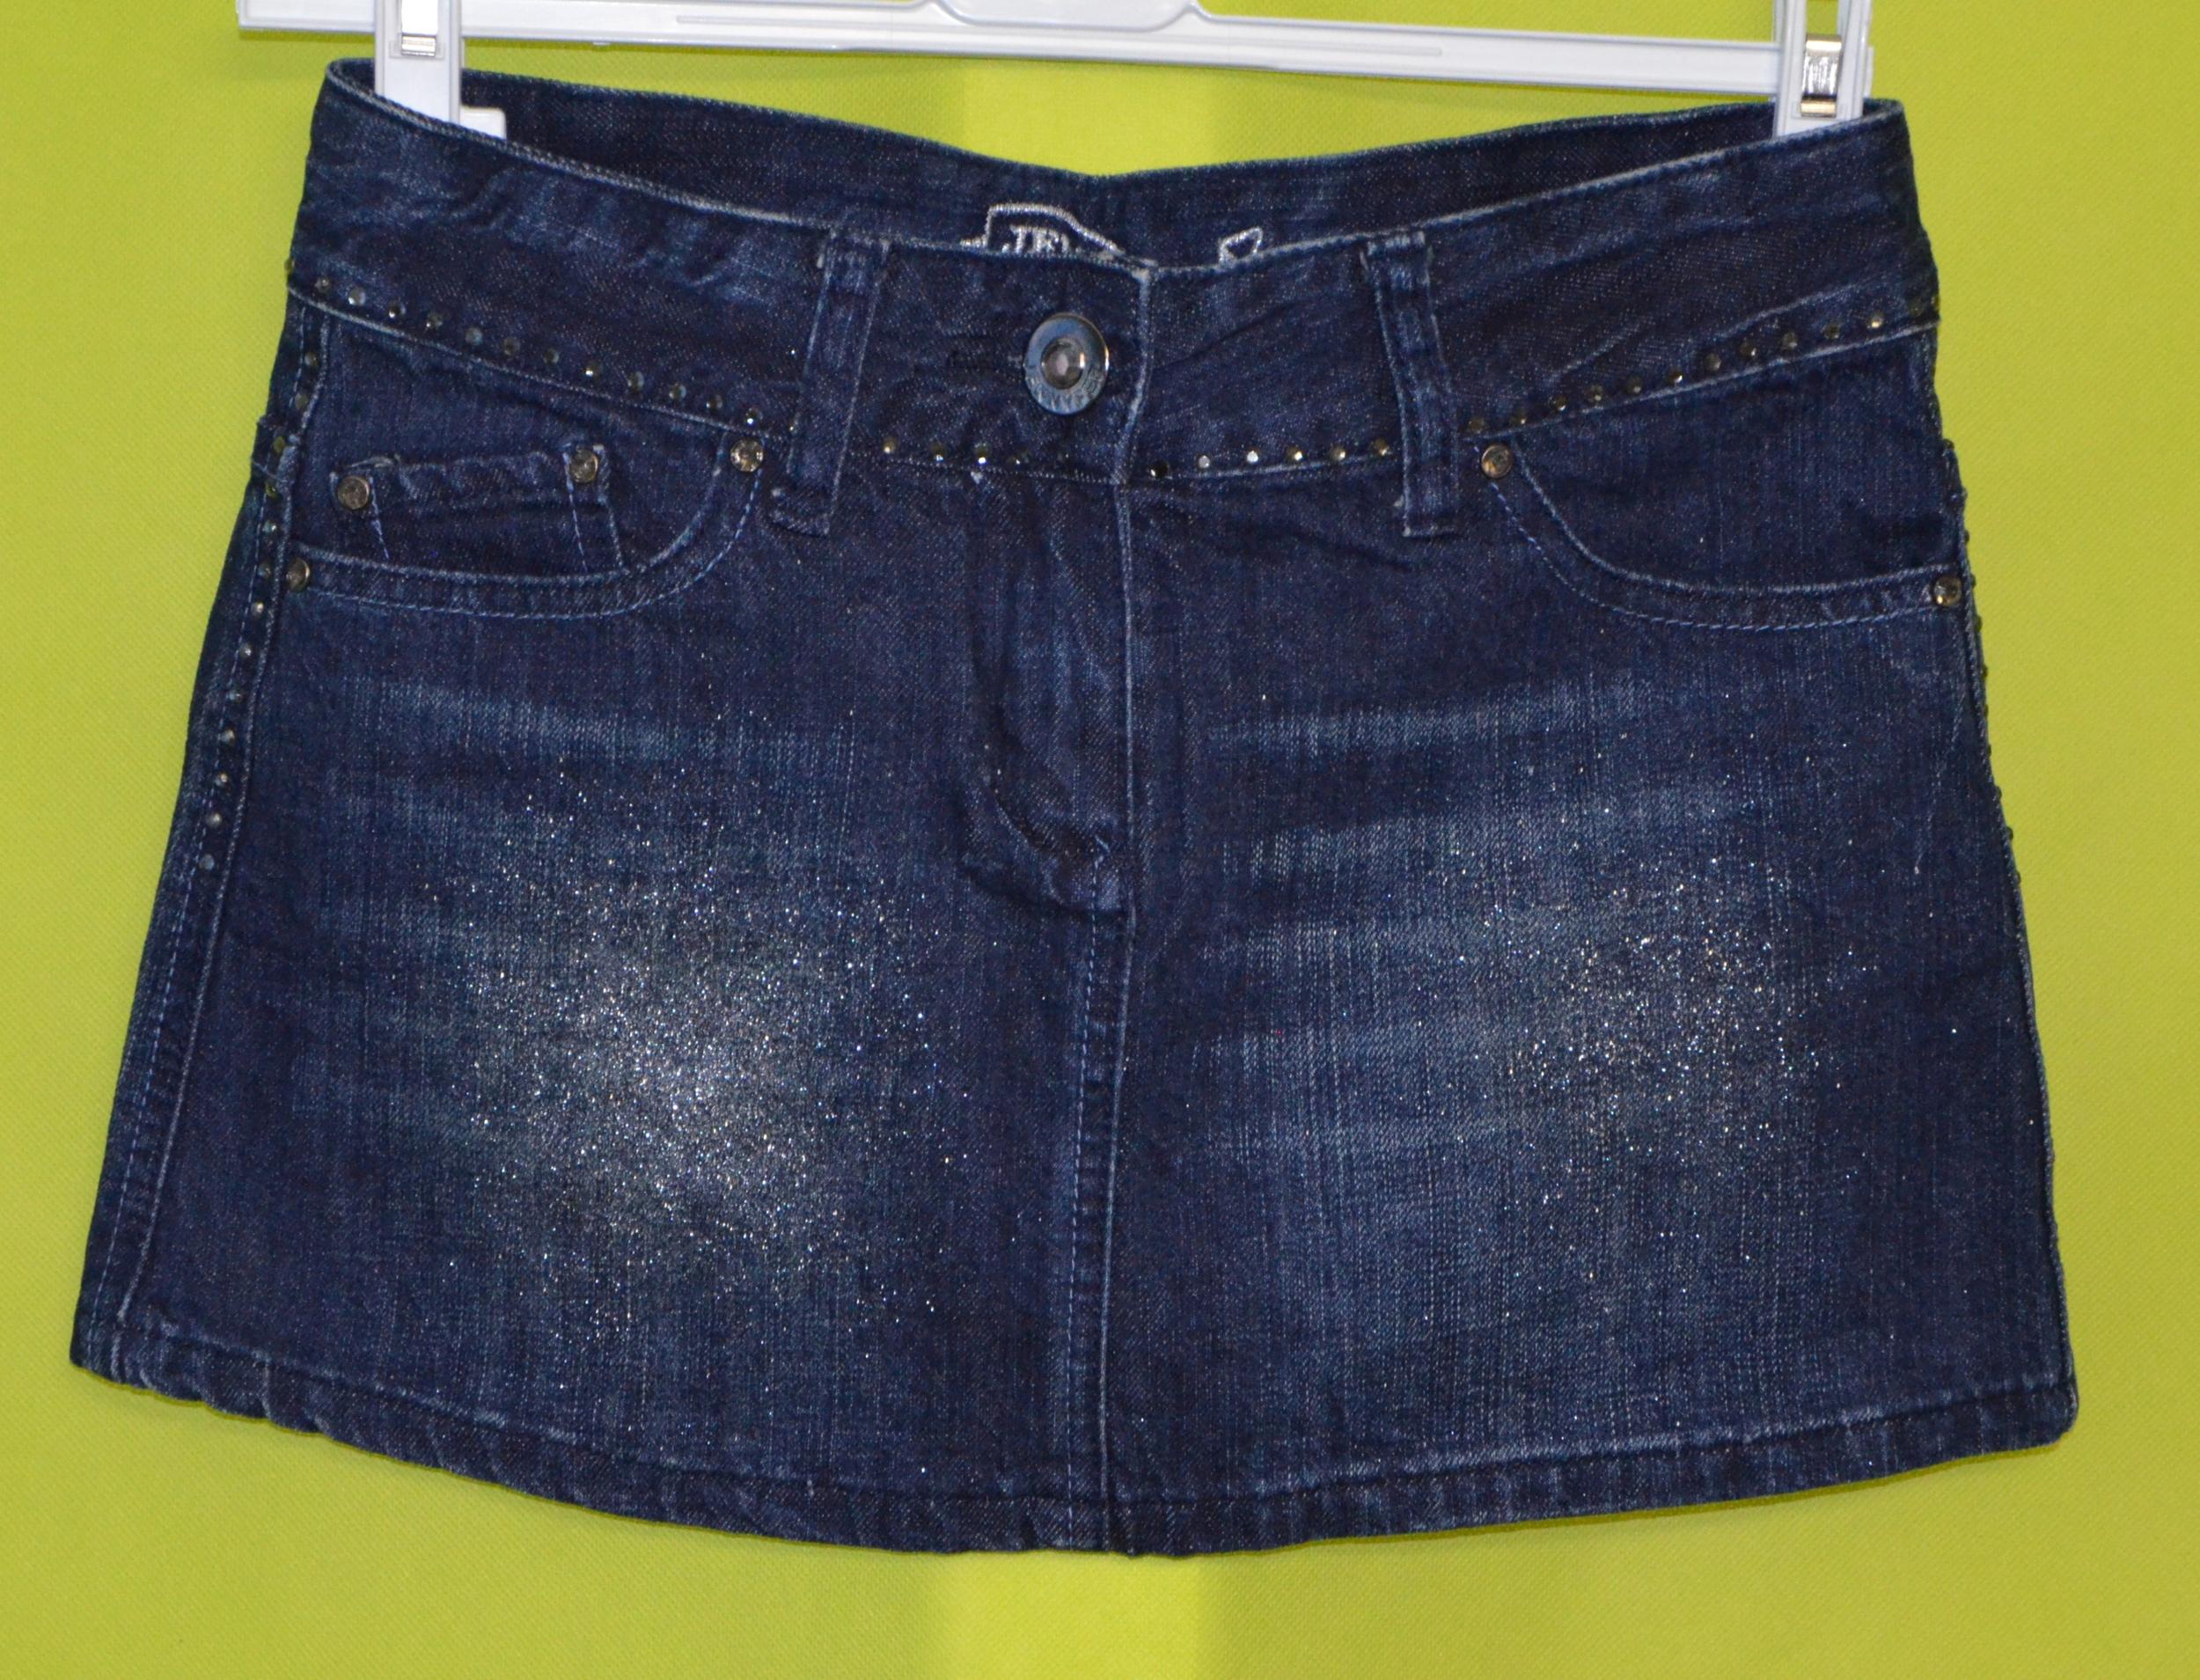 jupe jean bleu pailleté femme taille 36 jennyfer